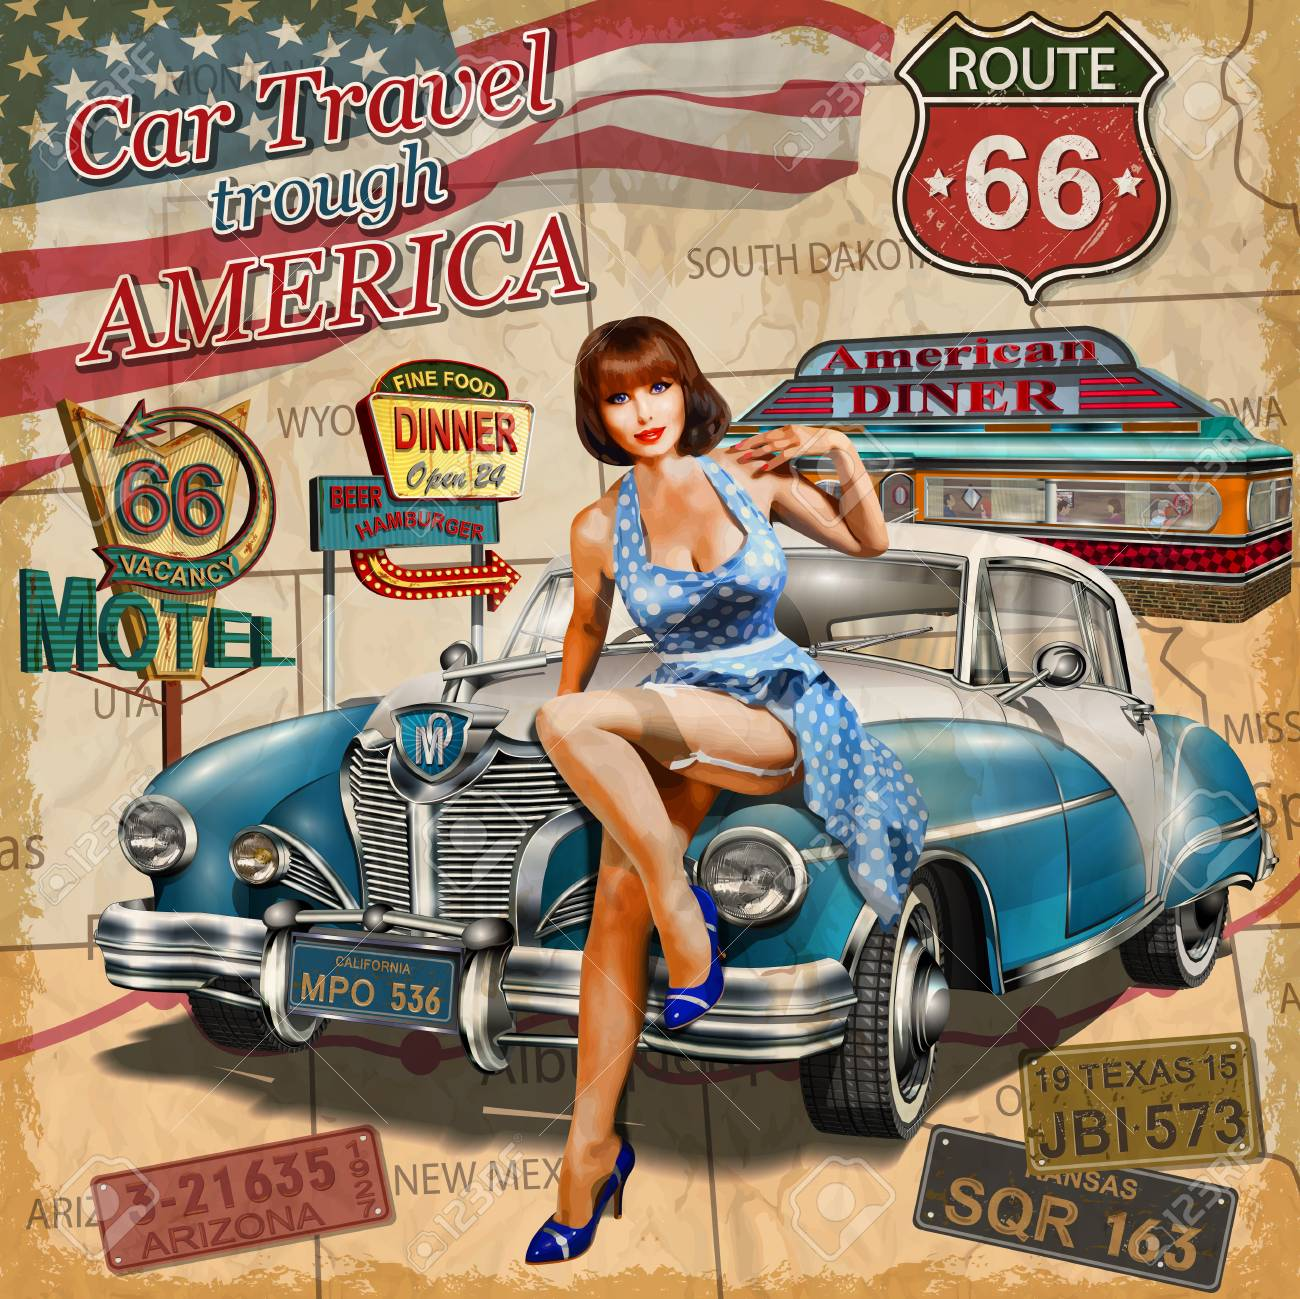 Car travel through America vintage poster. - 87869663